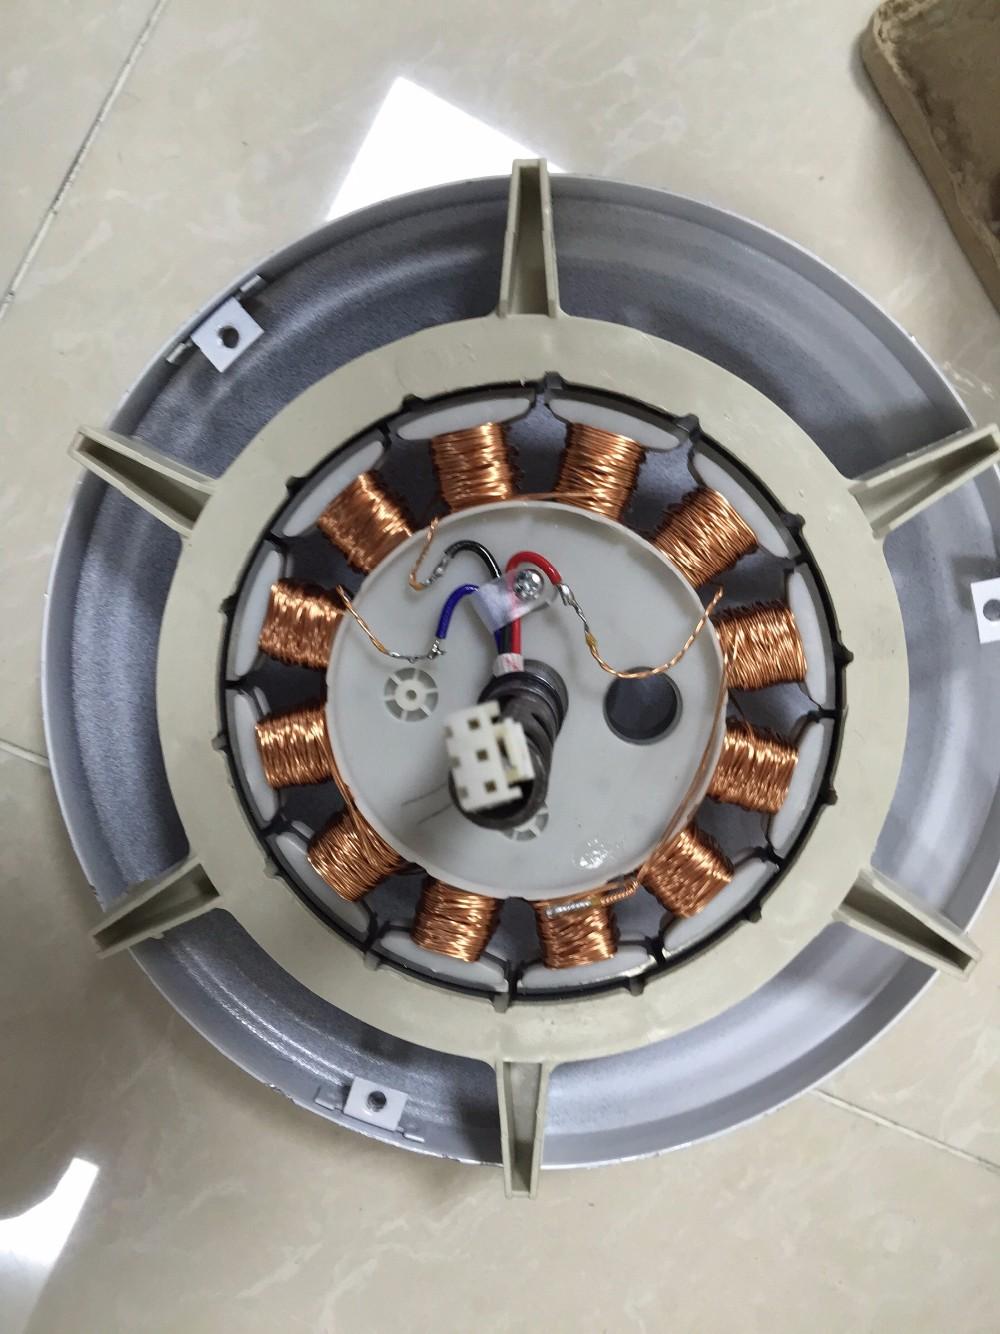 Bldc 12v electric brushless dc ceiling fan motor buy for 12v bldc motor specifications